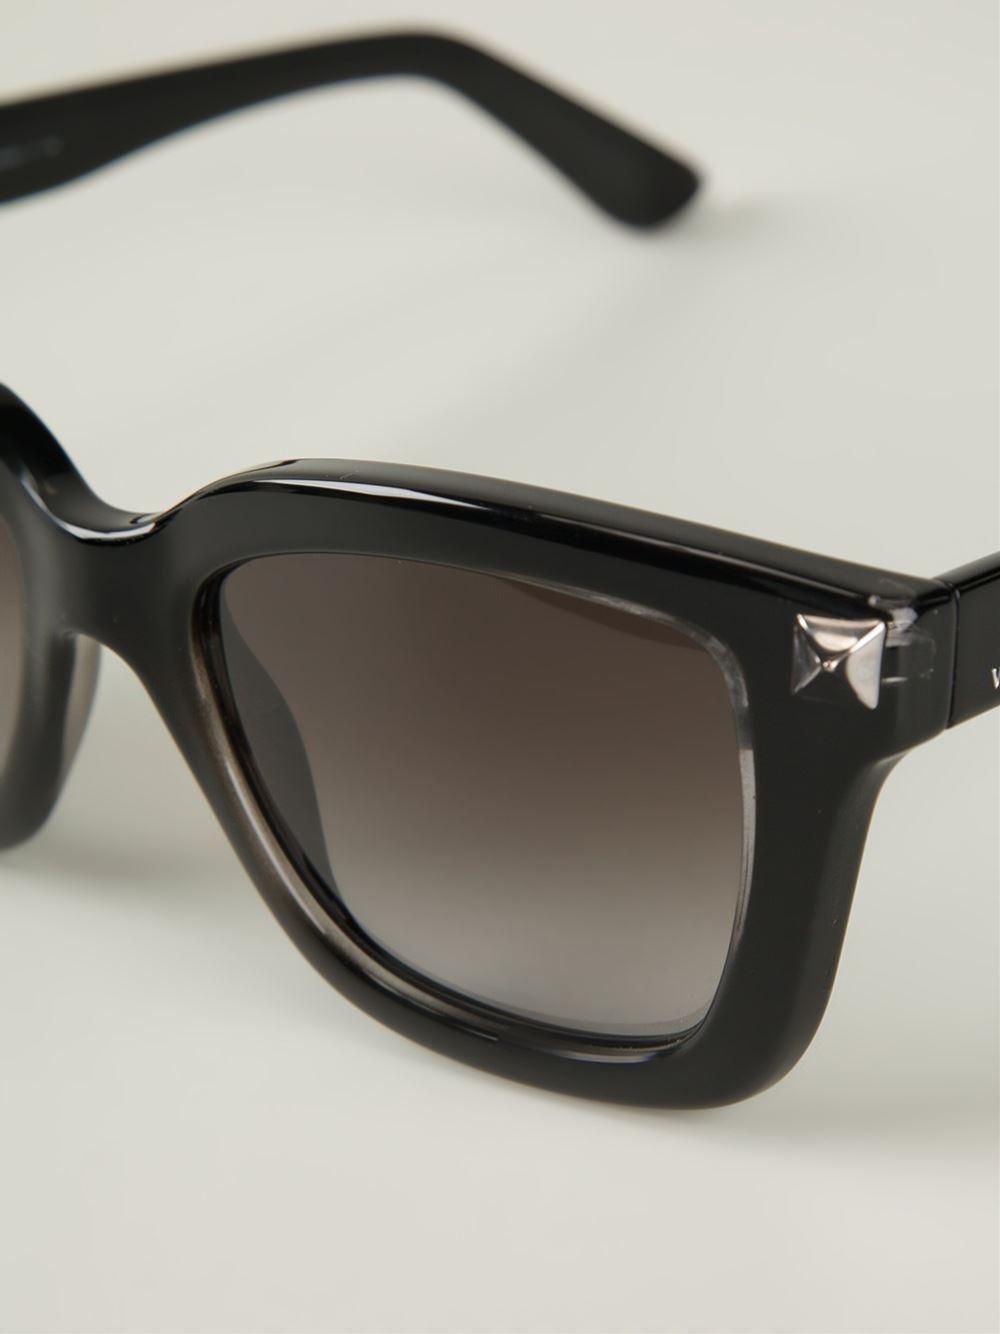 368a11c537 Valentino Sunglasses Rockstud